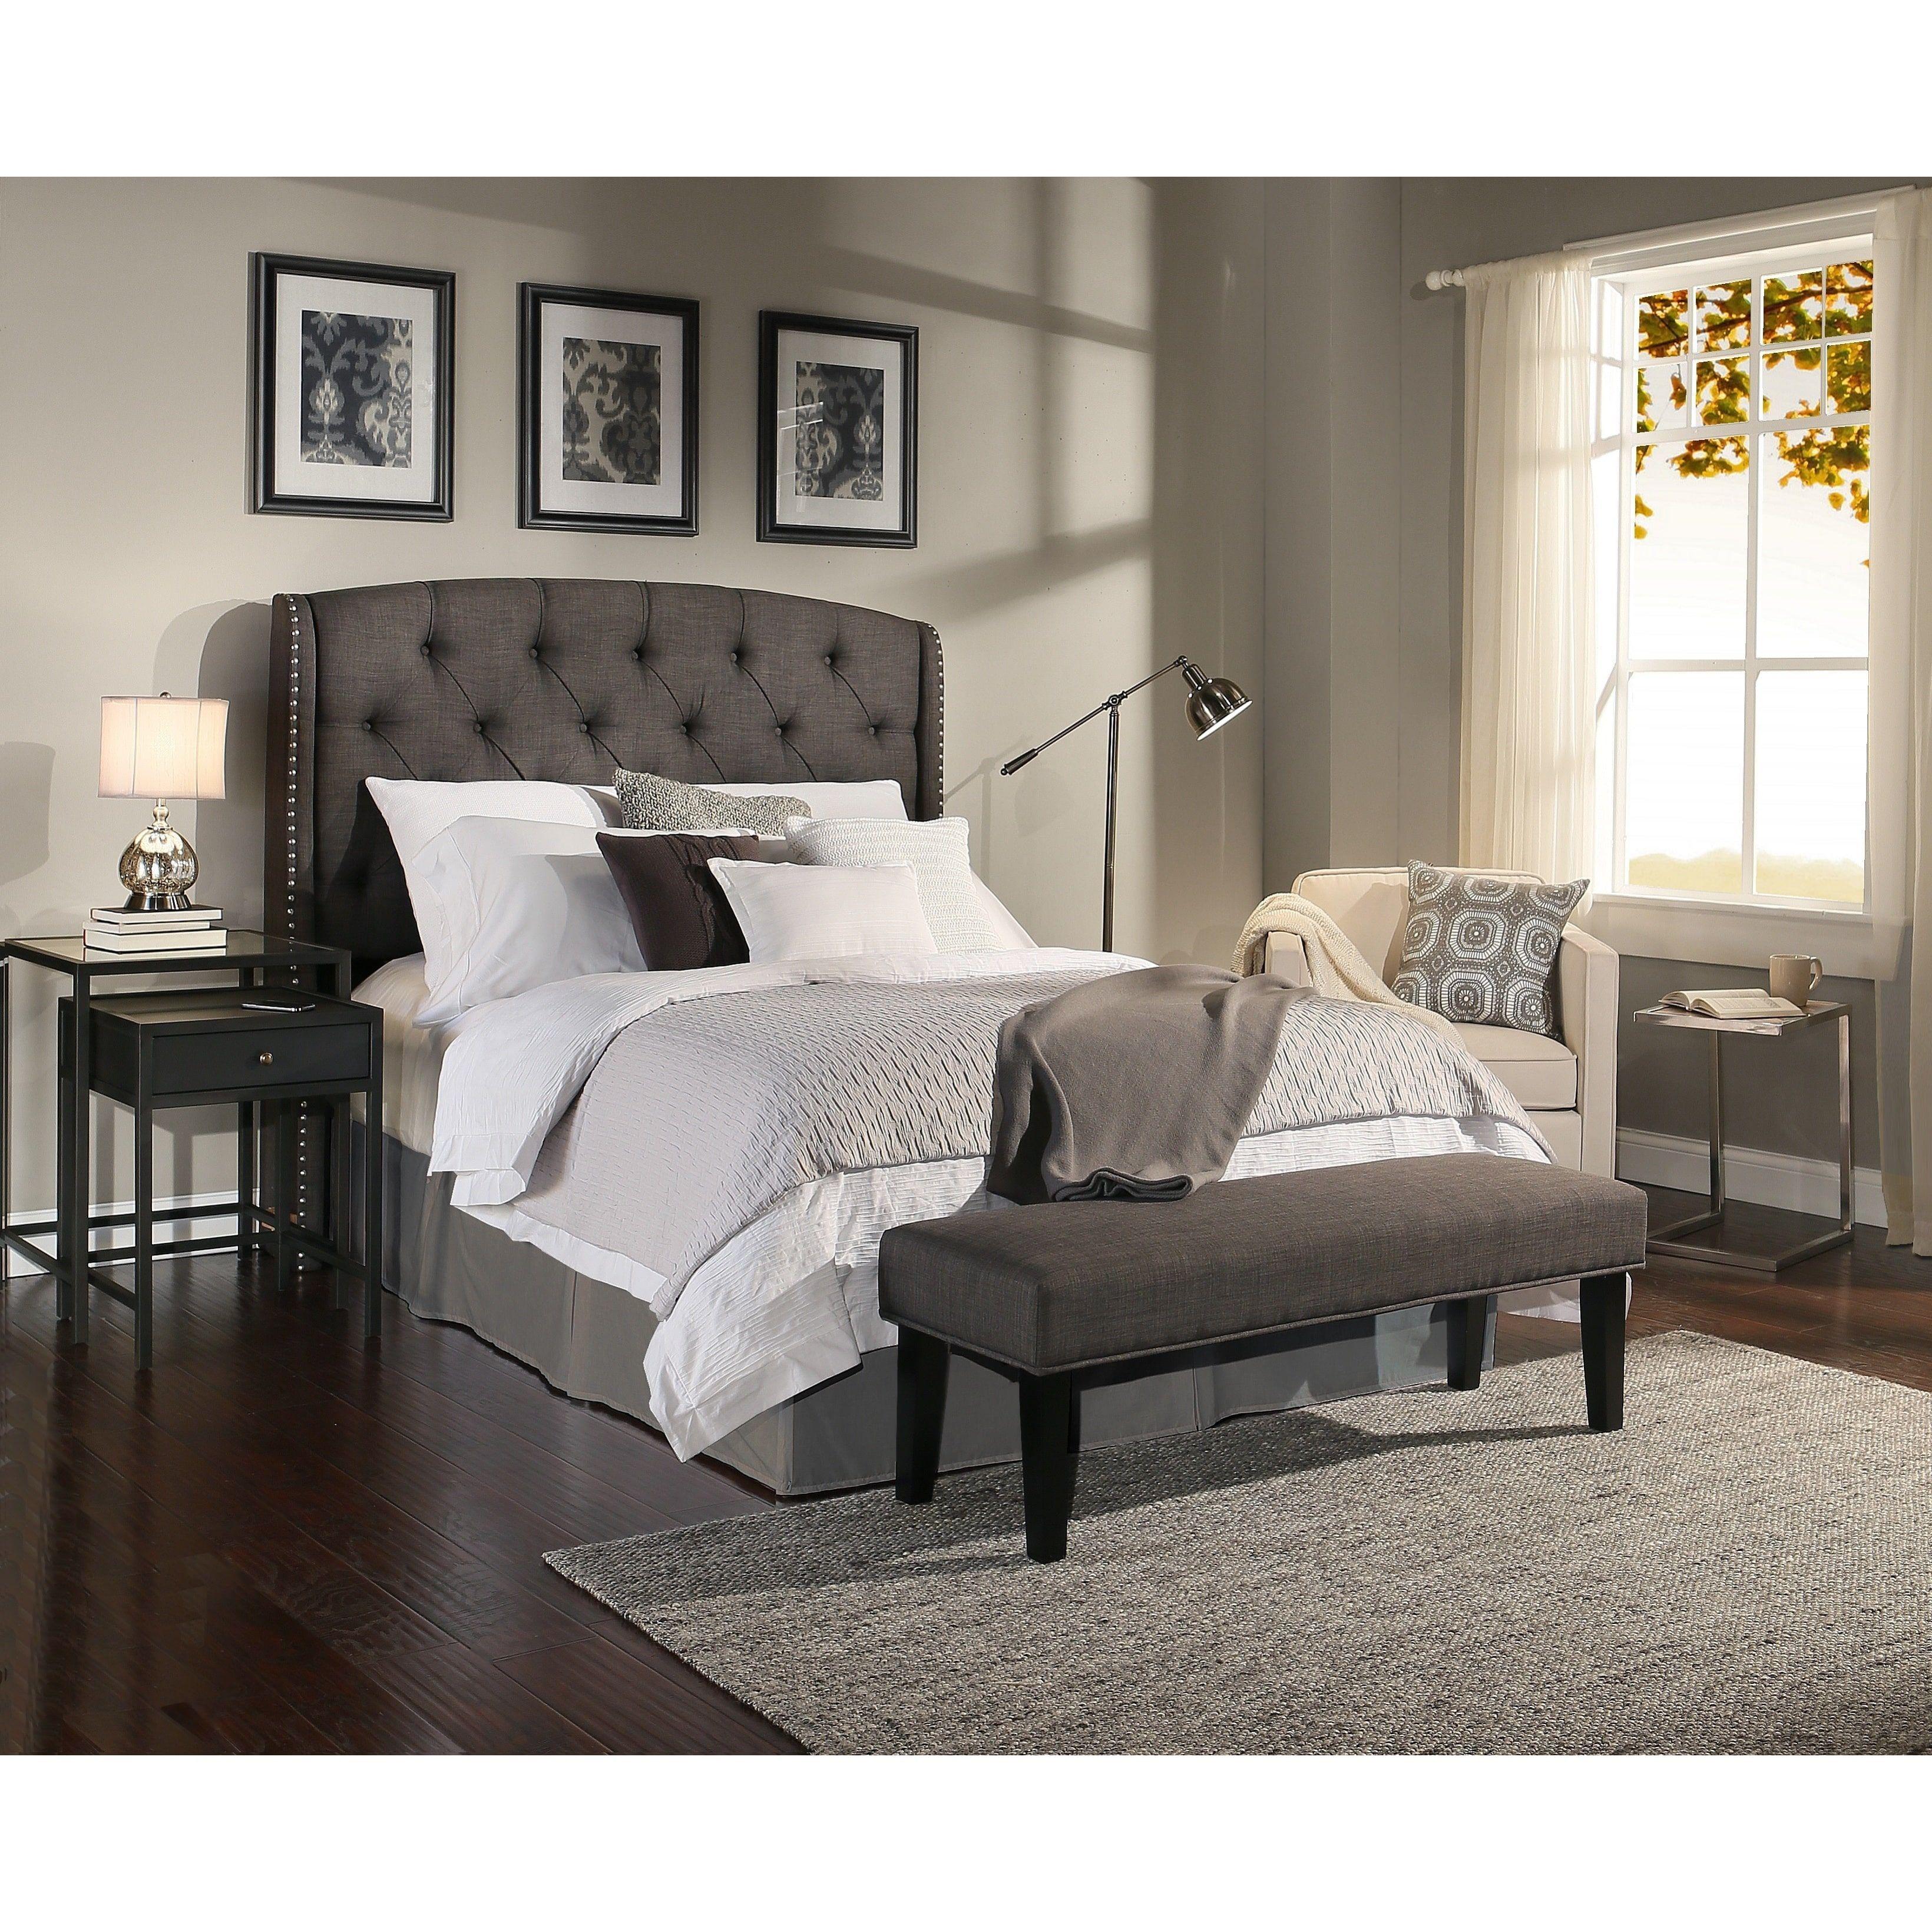 Overstockcom Online Shopping Bedding Furniture Electronics